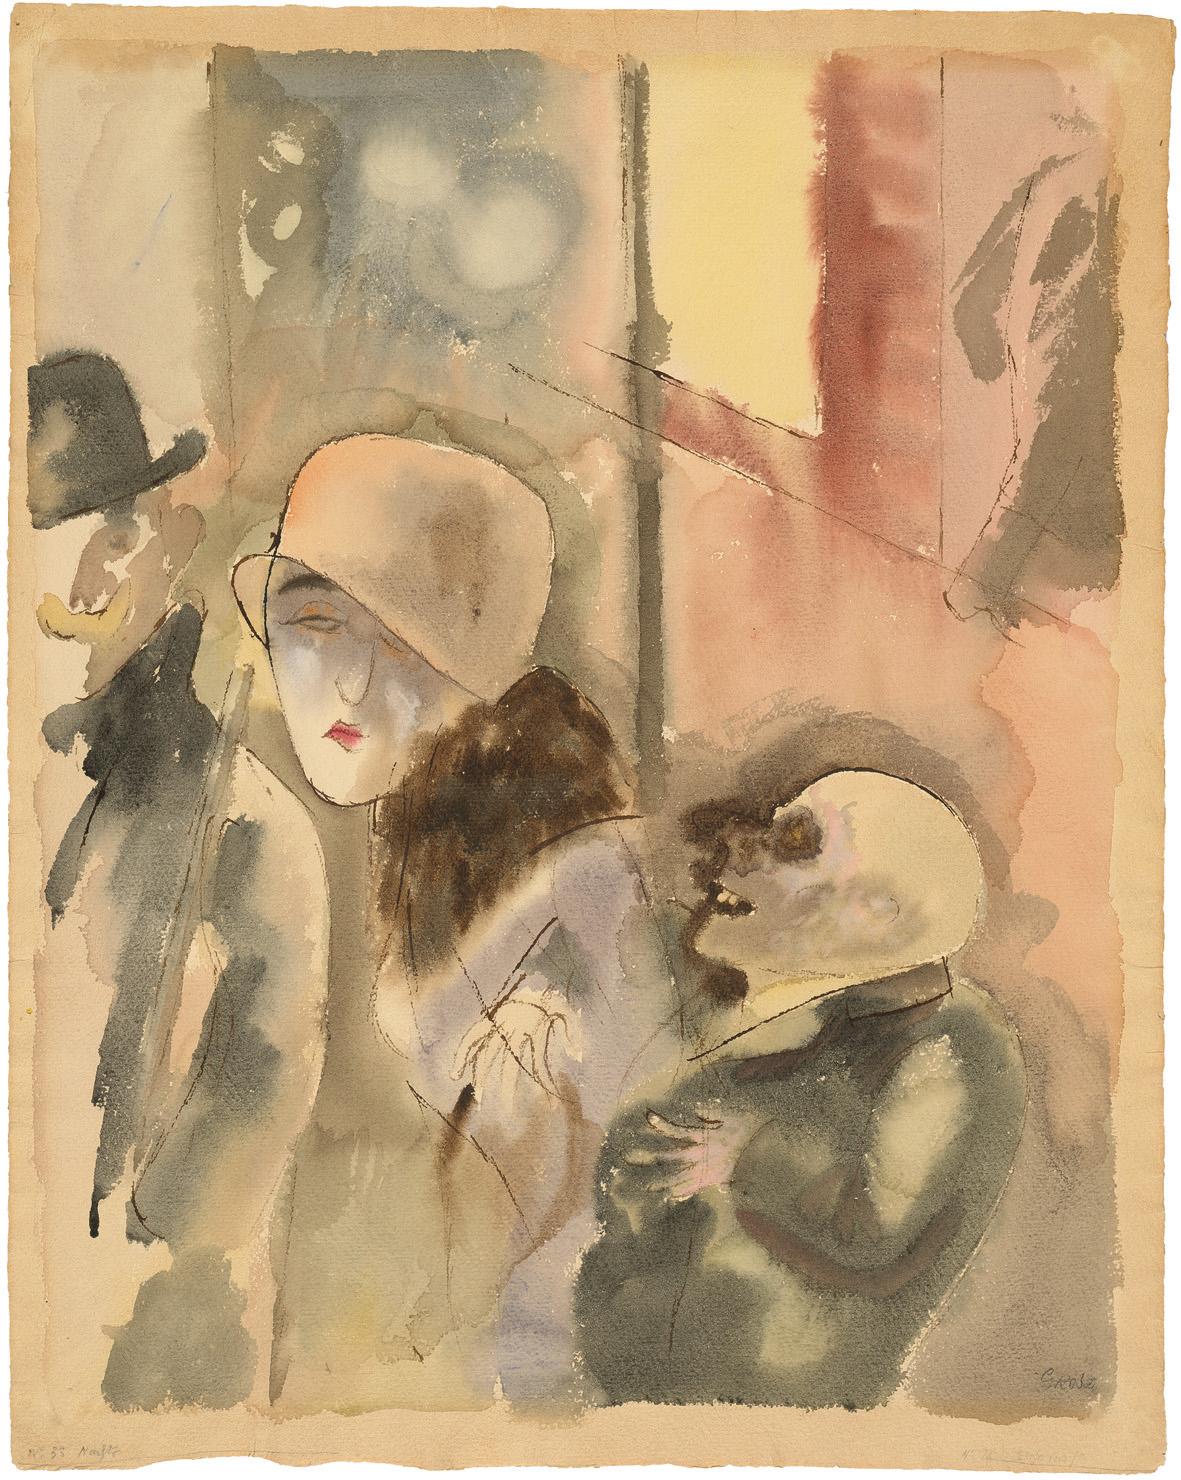 George Grosz  NACHTS Aquarell und Feder, 1916.  George Grosz: © Estate of George Grosz, Princeton, N.J. / VG Bild-Kunst, Bonn 2019.